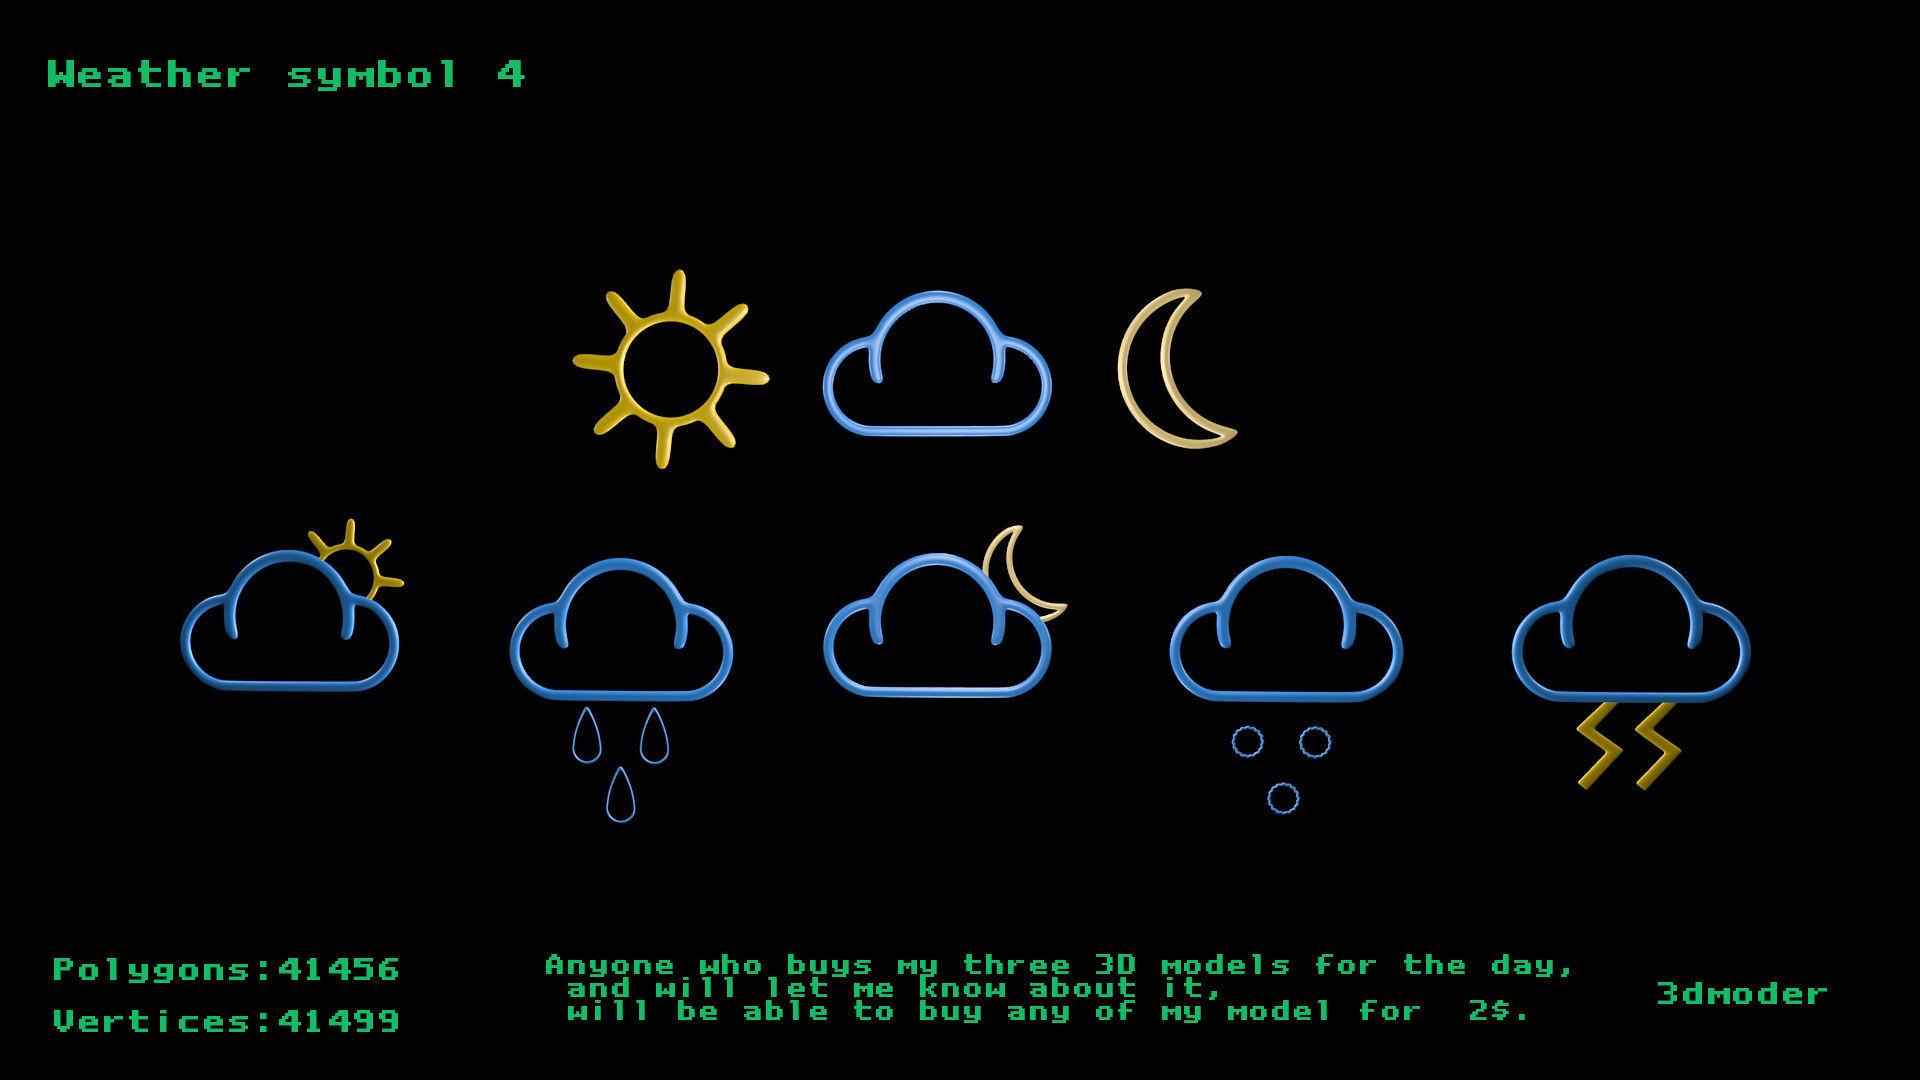 Weather symbol 4